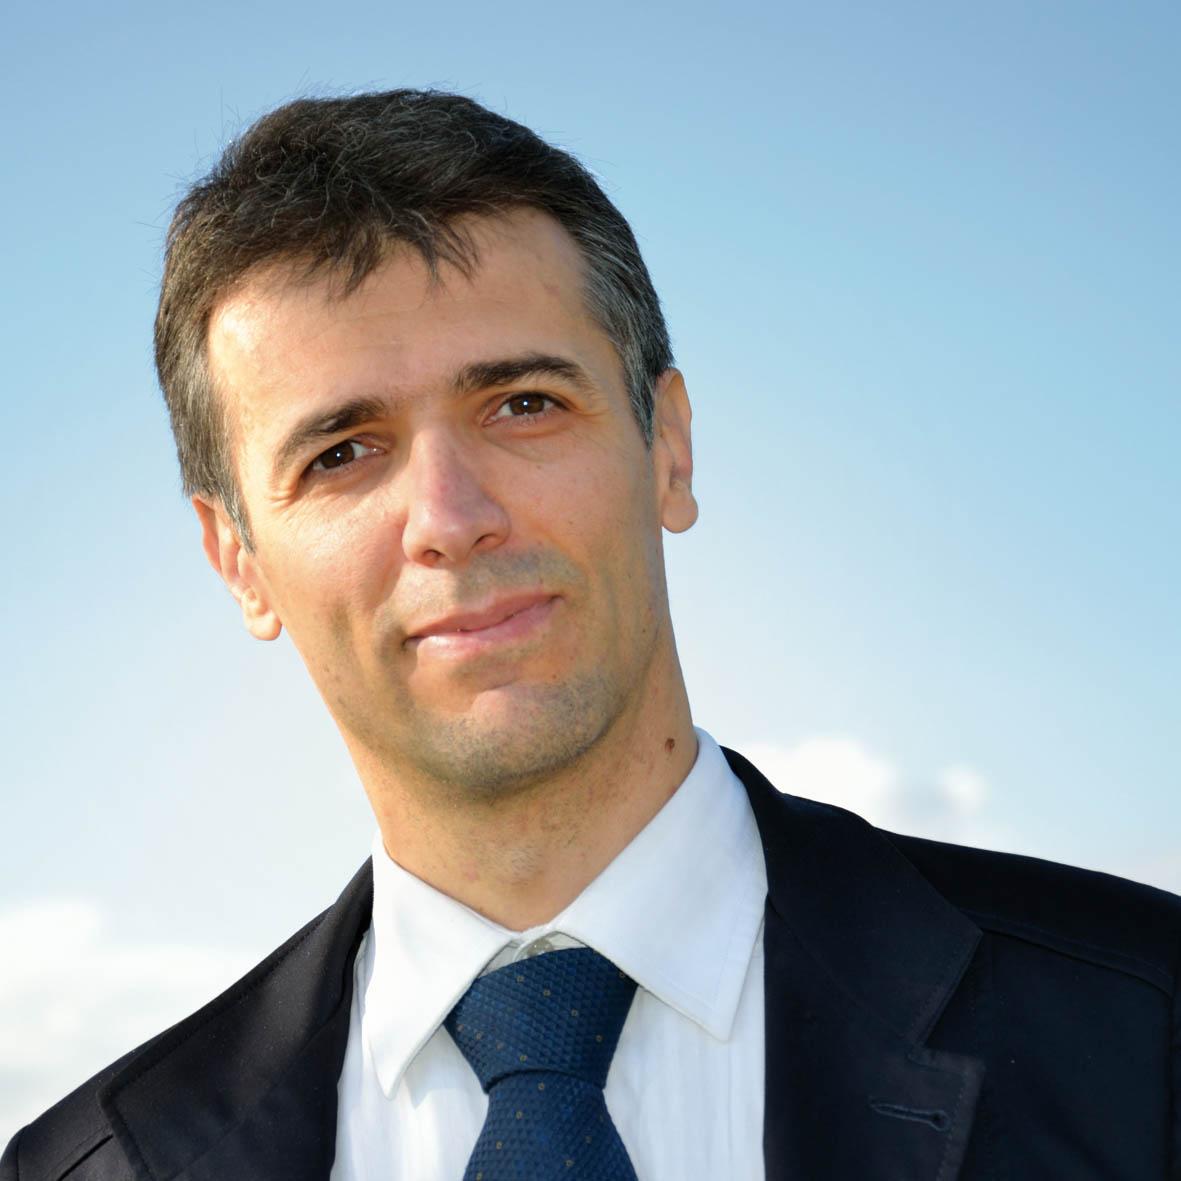 gianni-girotto2012.jpg